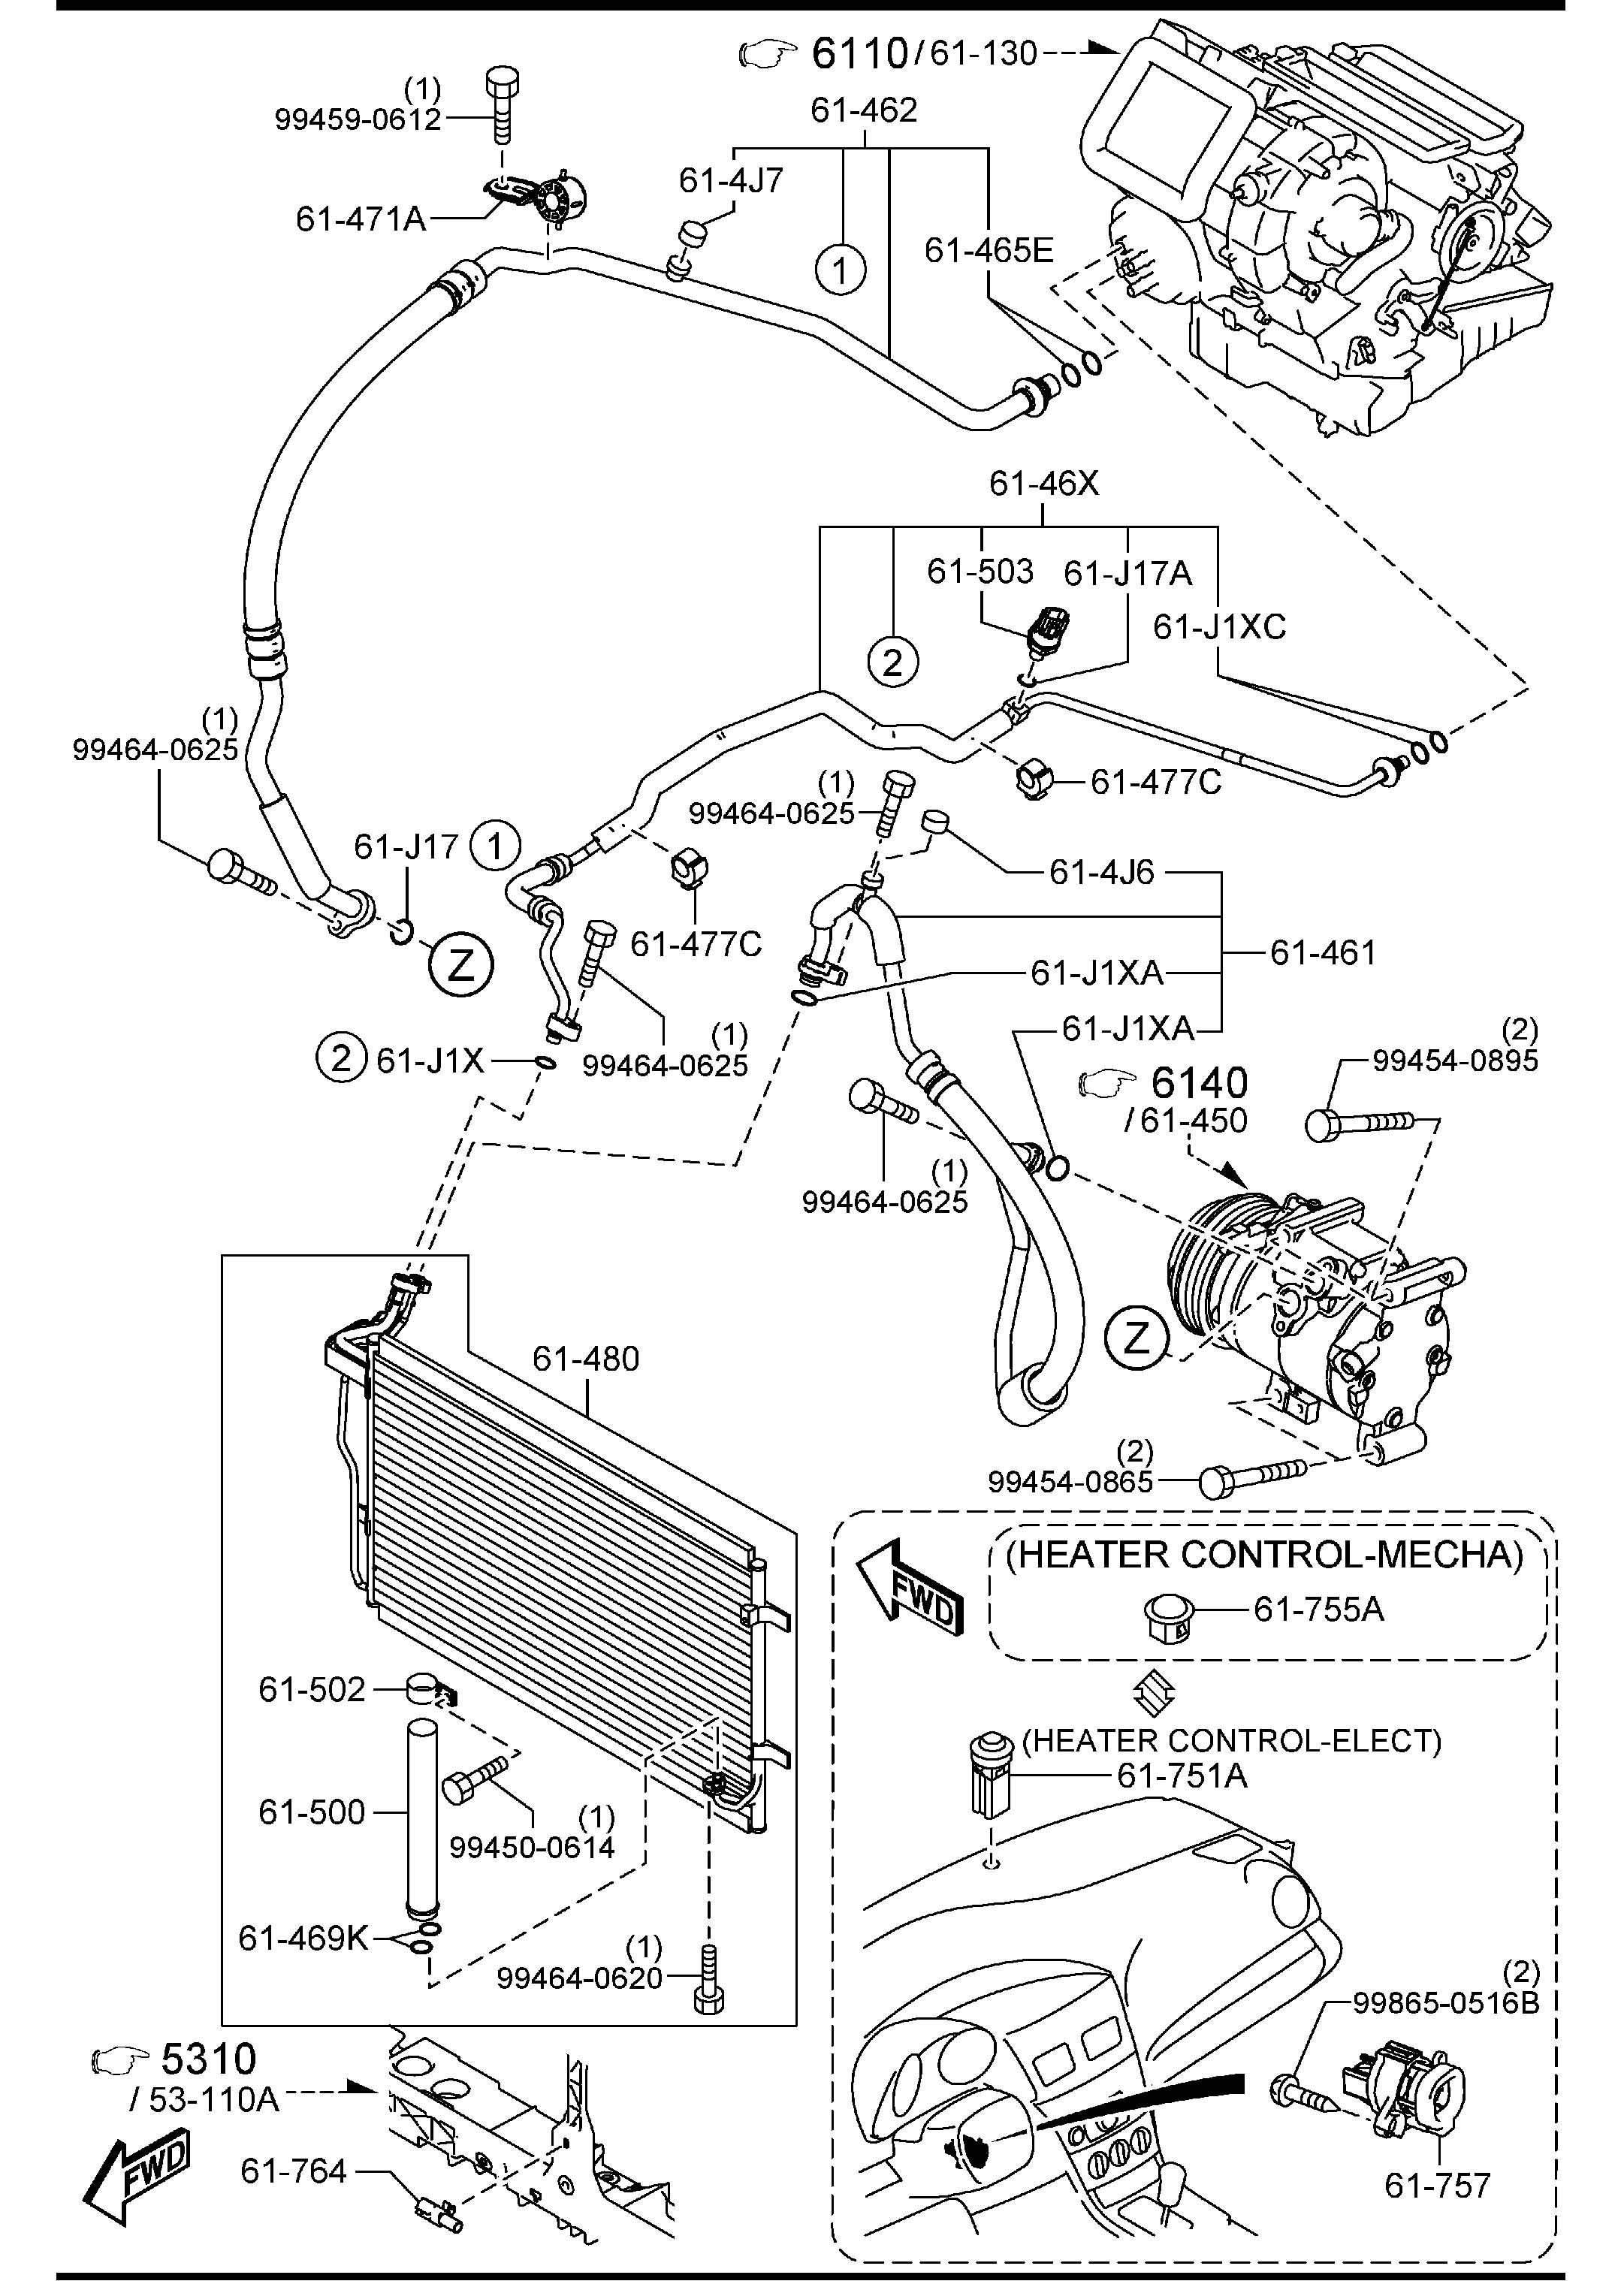 Mazda Mazda 3 Condenser. Controlmecha, wpollen